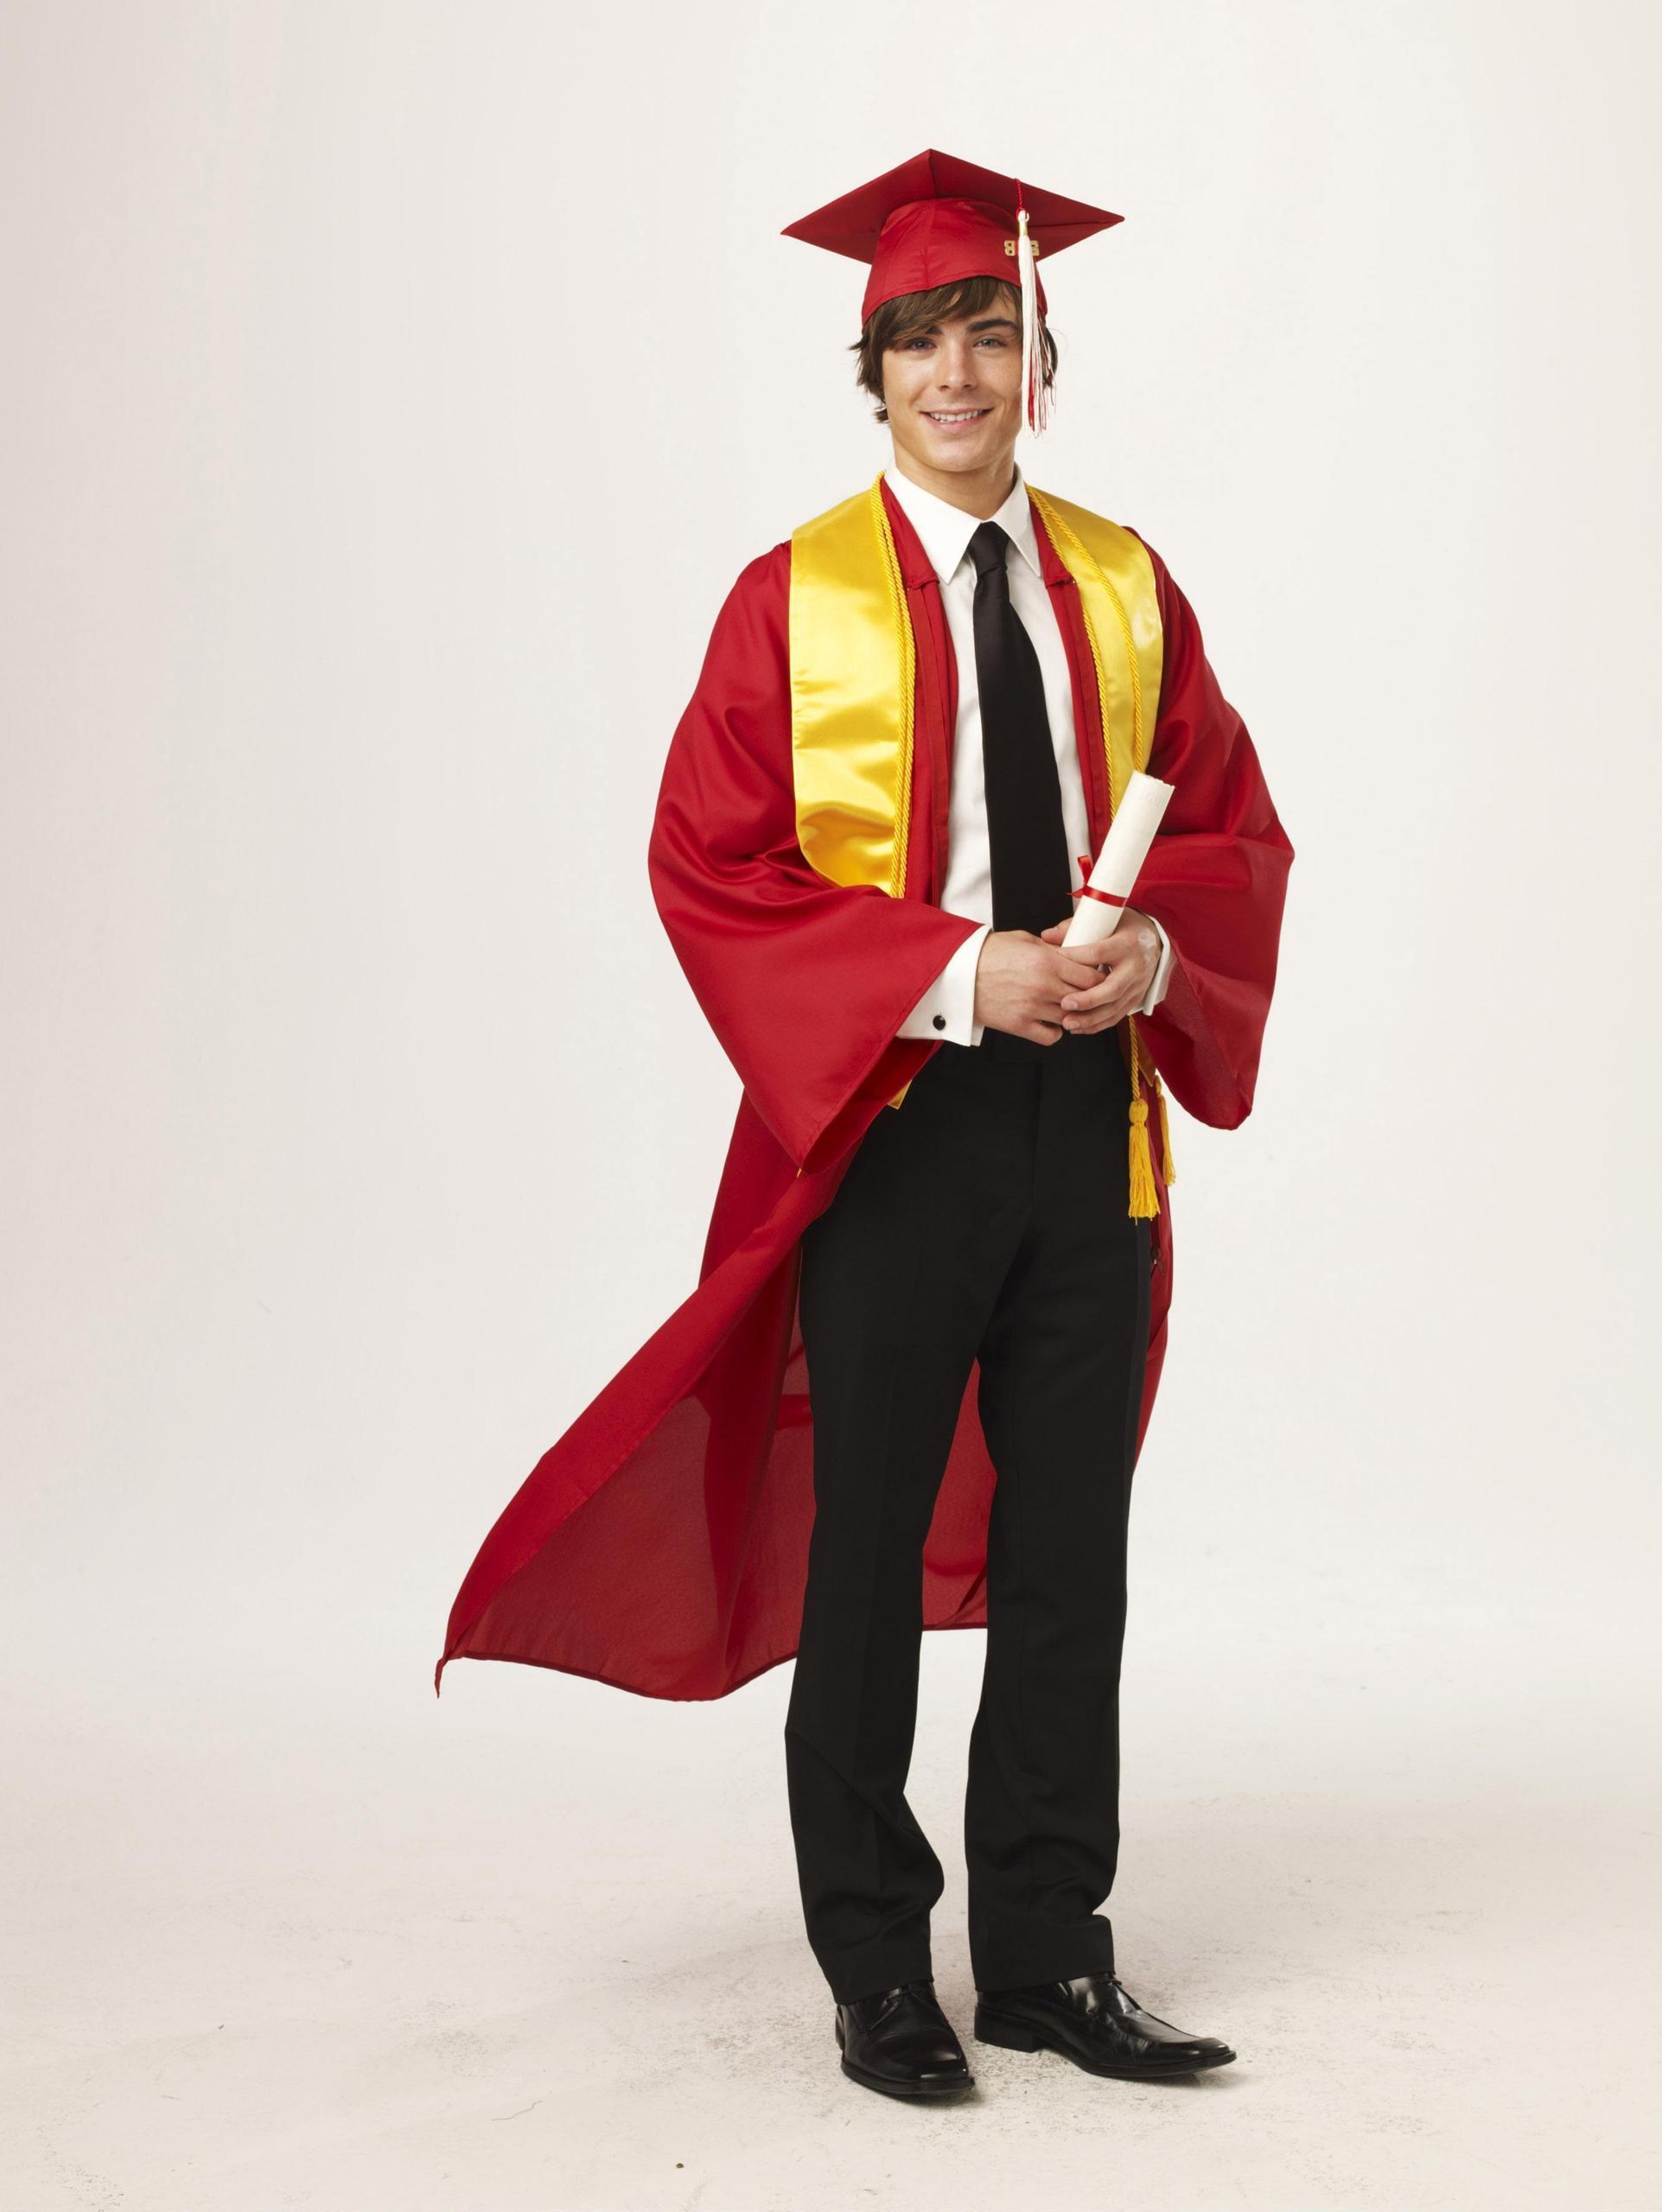 High School Musical 3 - Zac Efron